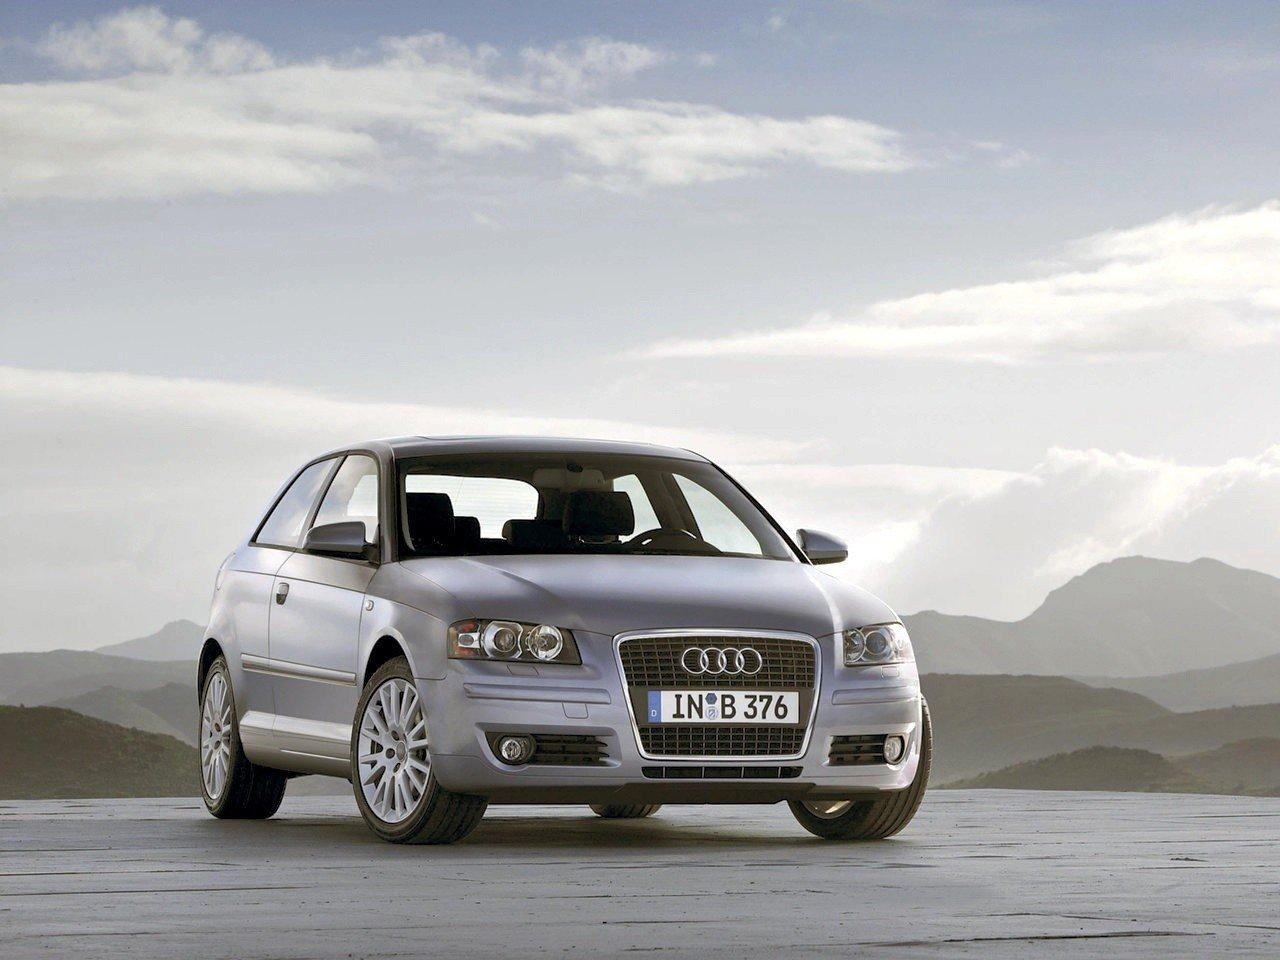 Audi A3 1.9TDI EDC16U 0281011383 03G906016J 5347 1037368596